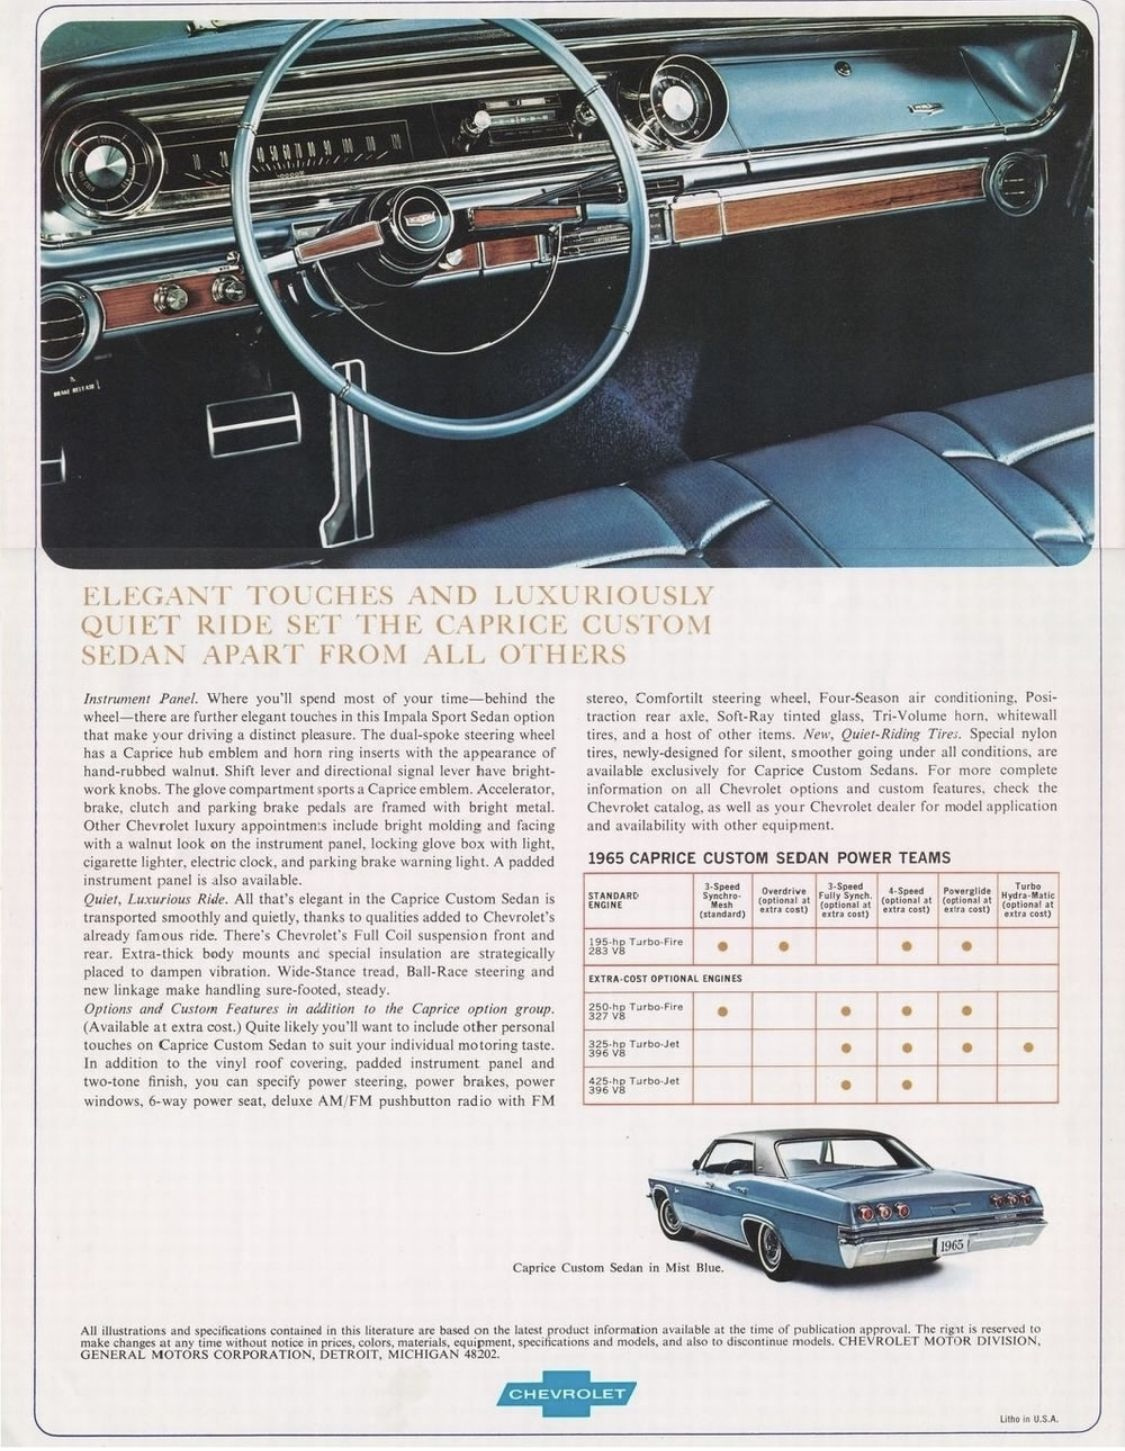 1965 Chevrolet Caprice Chevrolet Sedan Chevrolet Caprice